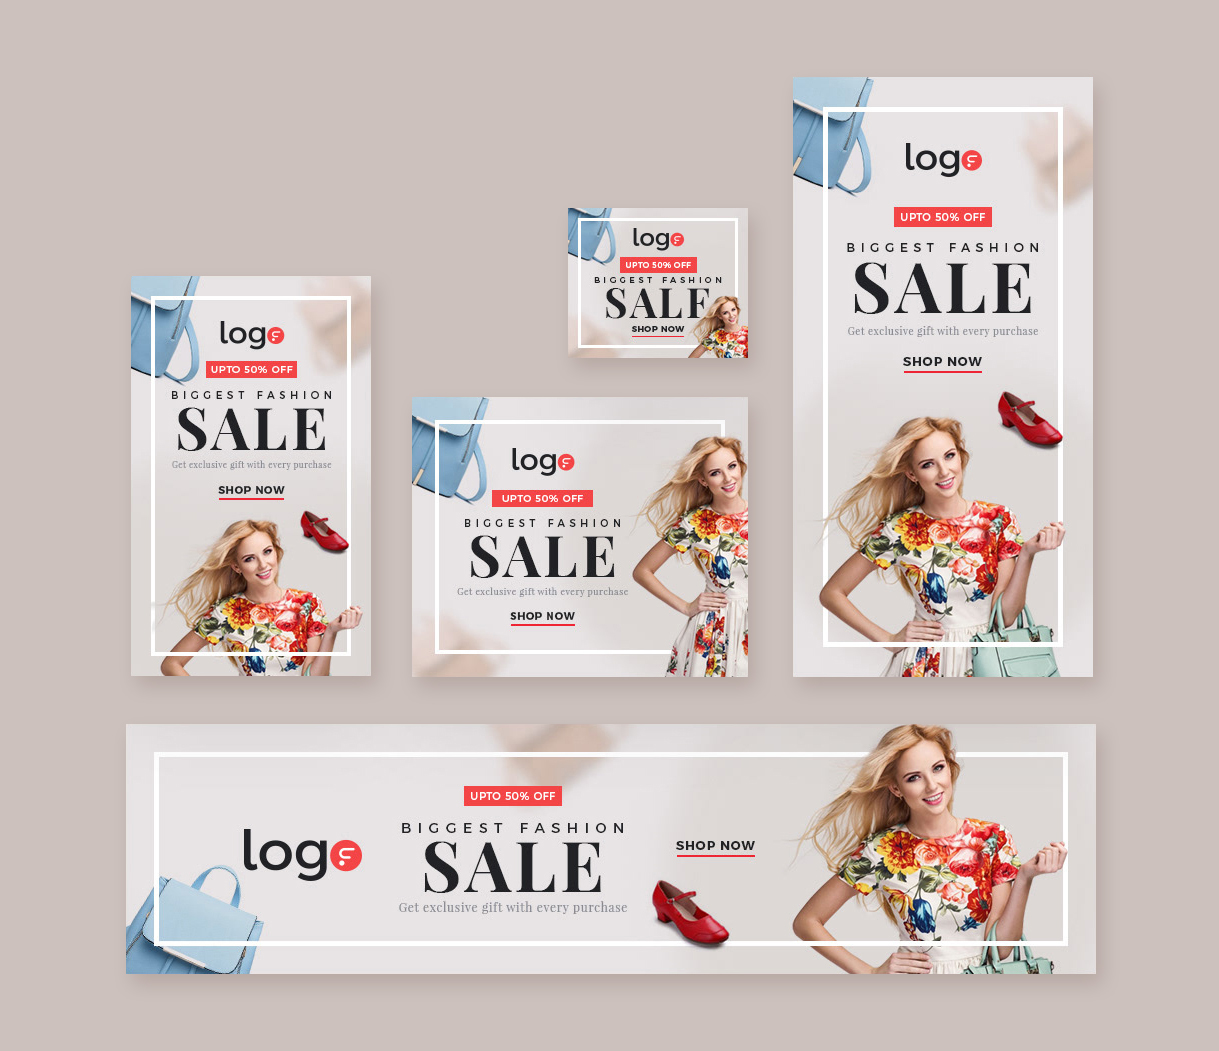 Fashion Sale Web Banners Template